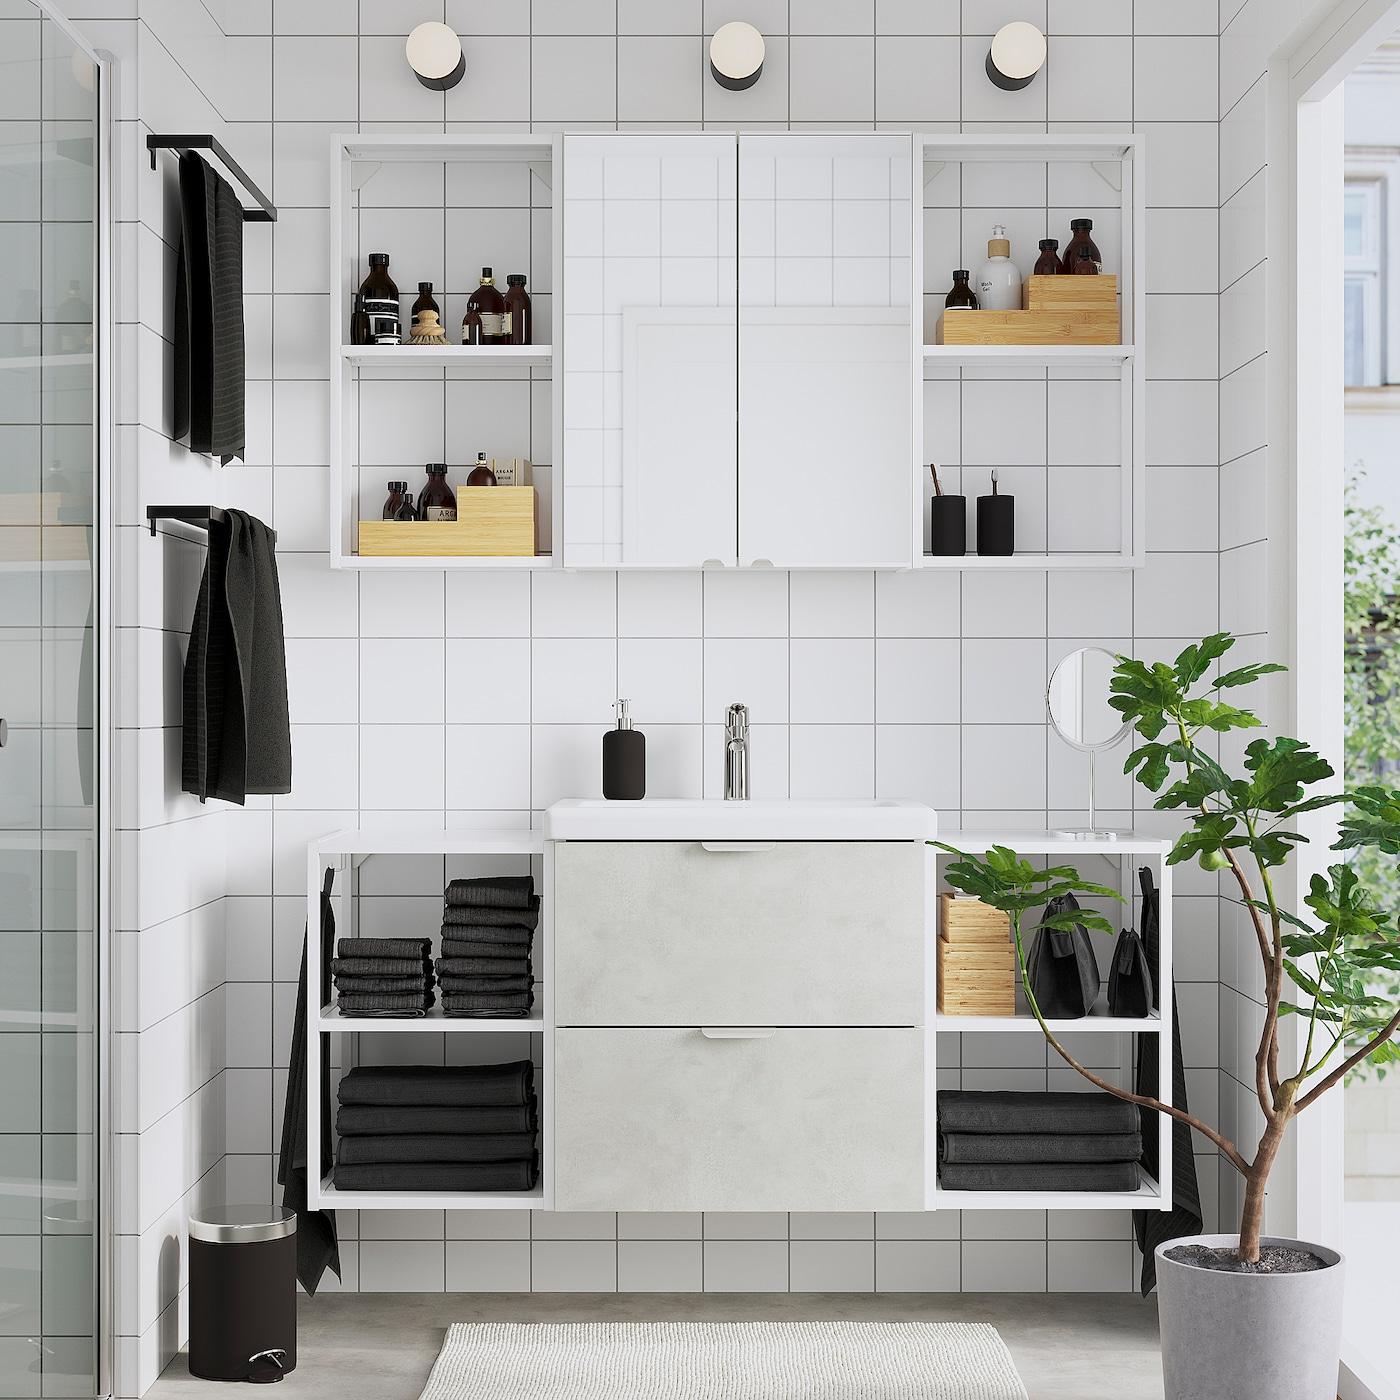 ENHET / TVÄLLEN Badkamermeubels, 18-delig, betonpatroon/wit BROGRUND kraan, 140x43x65 cm